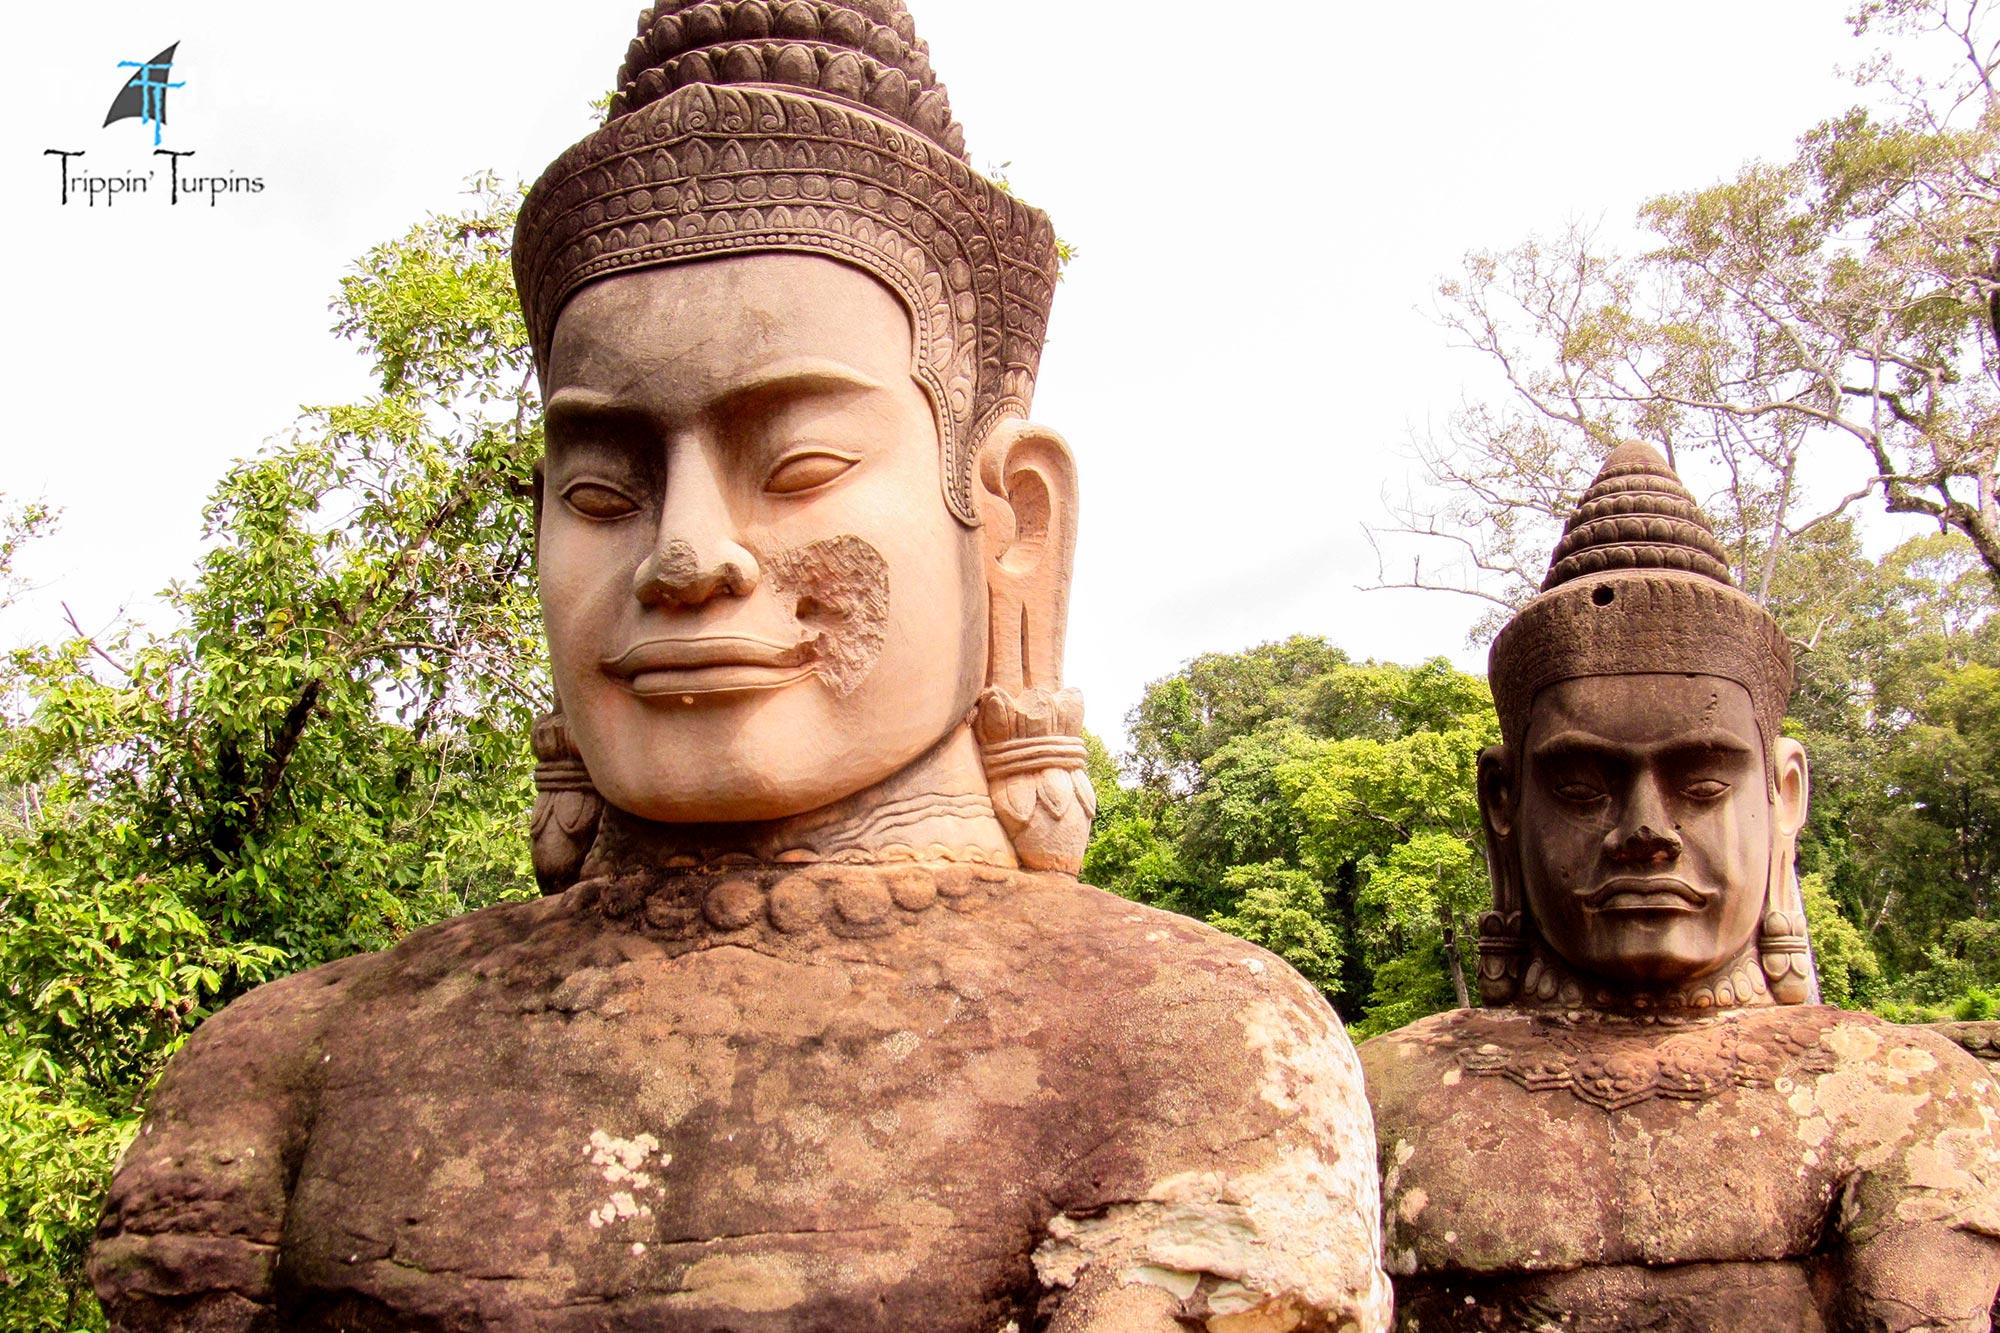 Statues on Angkor Thom's East Gate Bridge, Cambodia